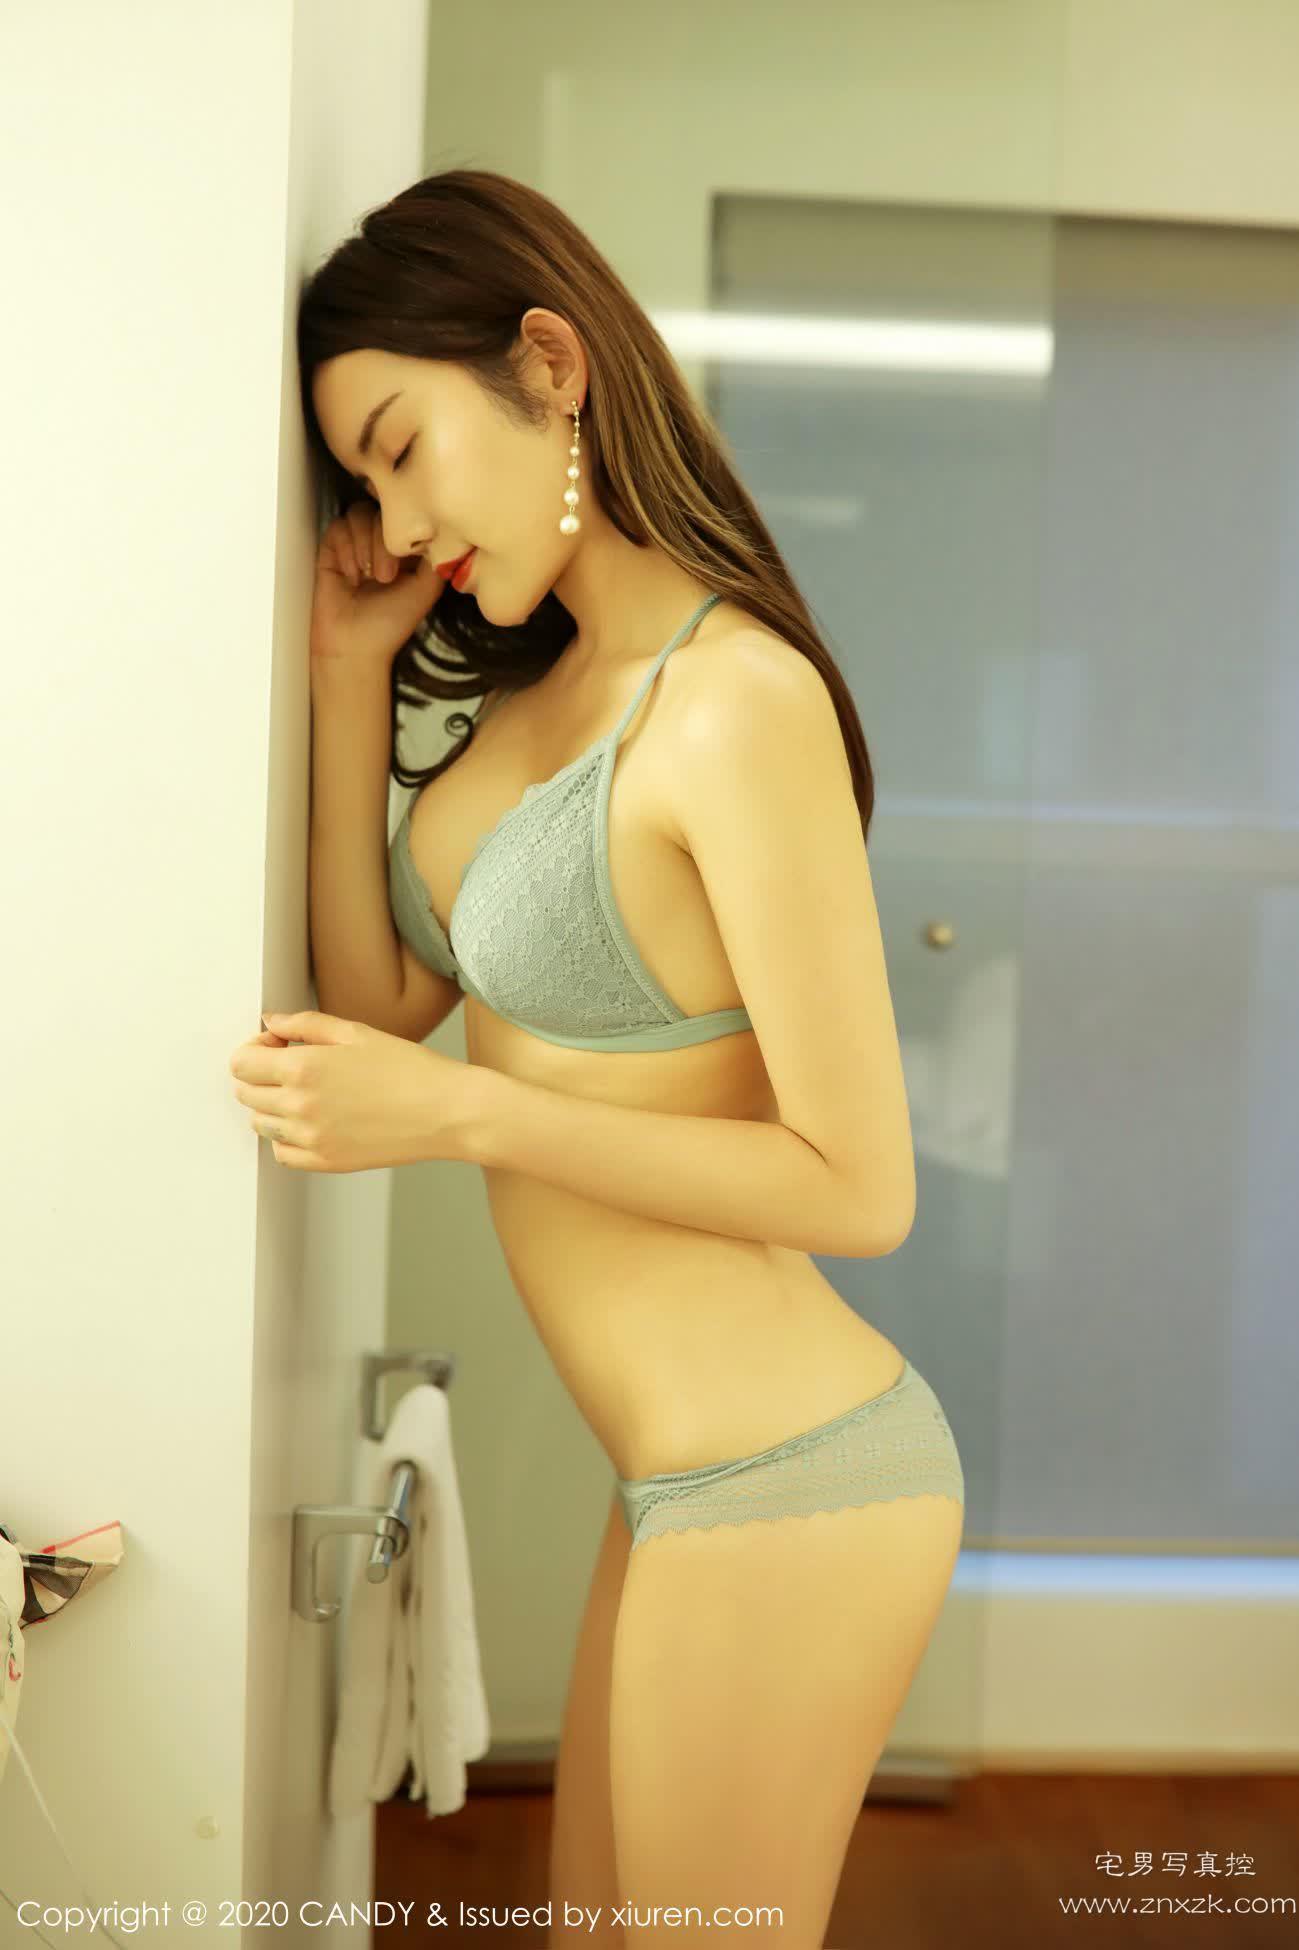 CANDY糖果画报 Vol.076 Cris卓娅祺